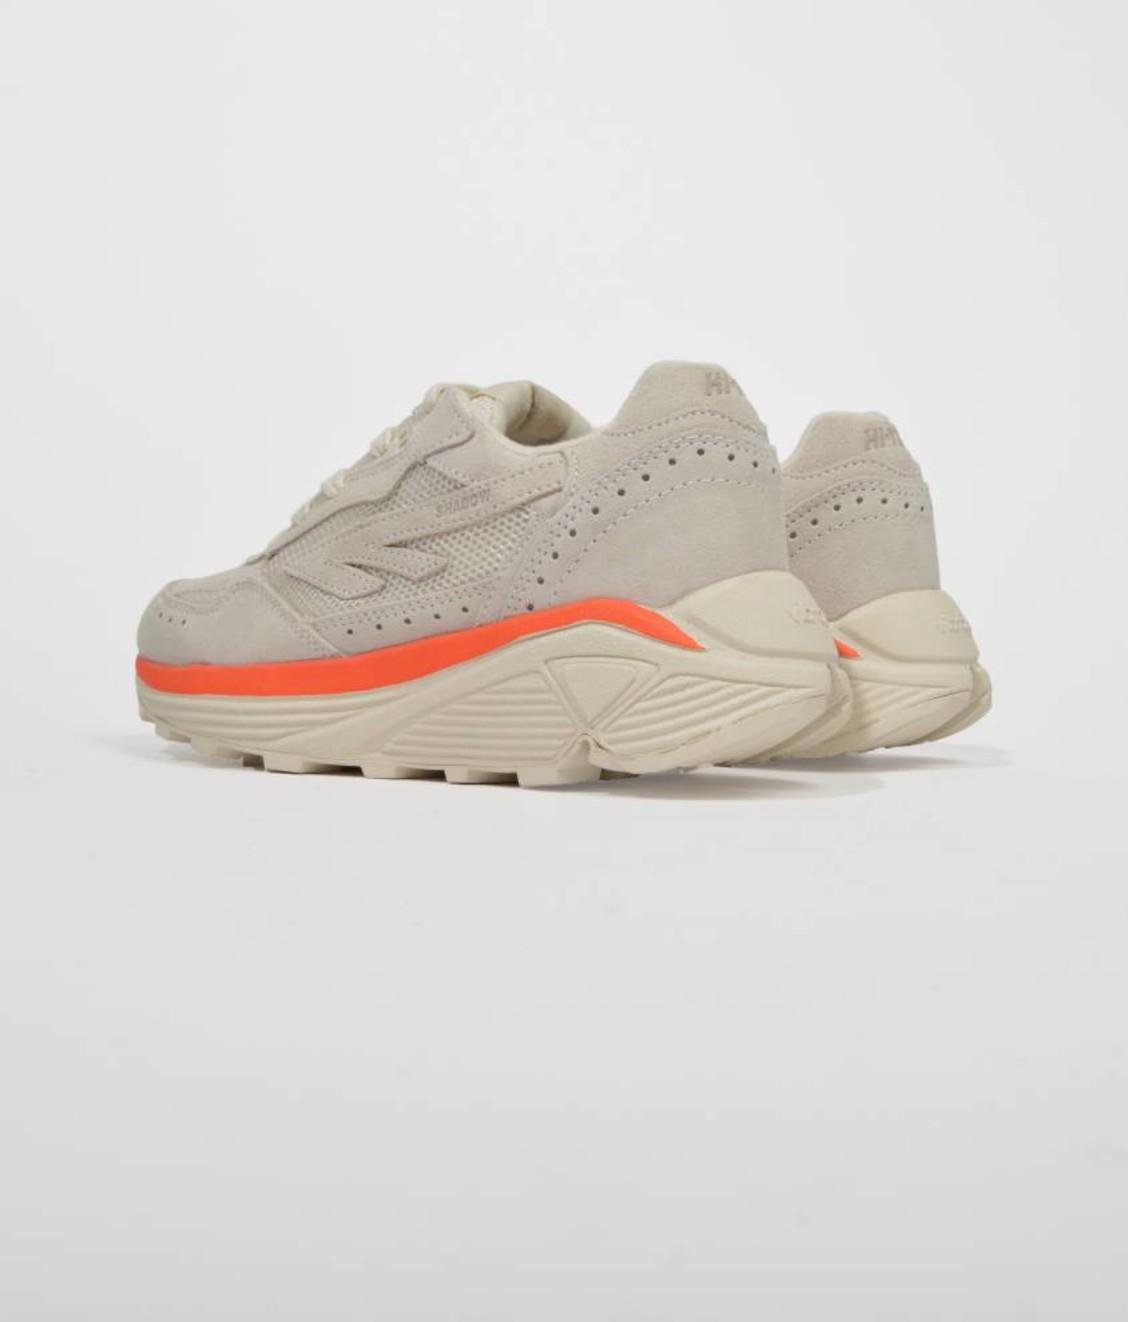 Hi-Tec Hi-Tec HTS Silver Shadow RGS Offwhite Orange